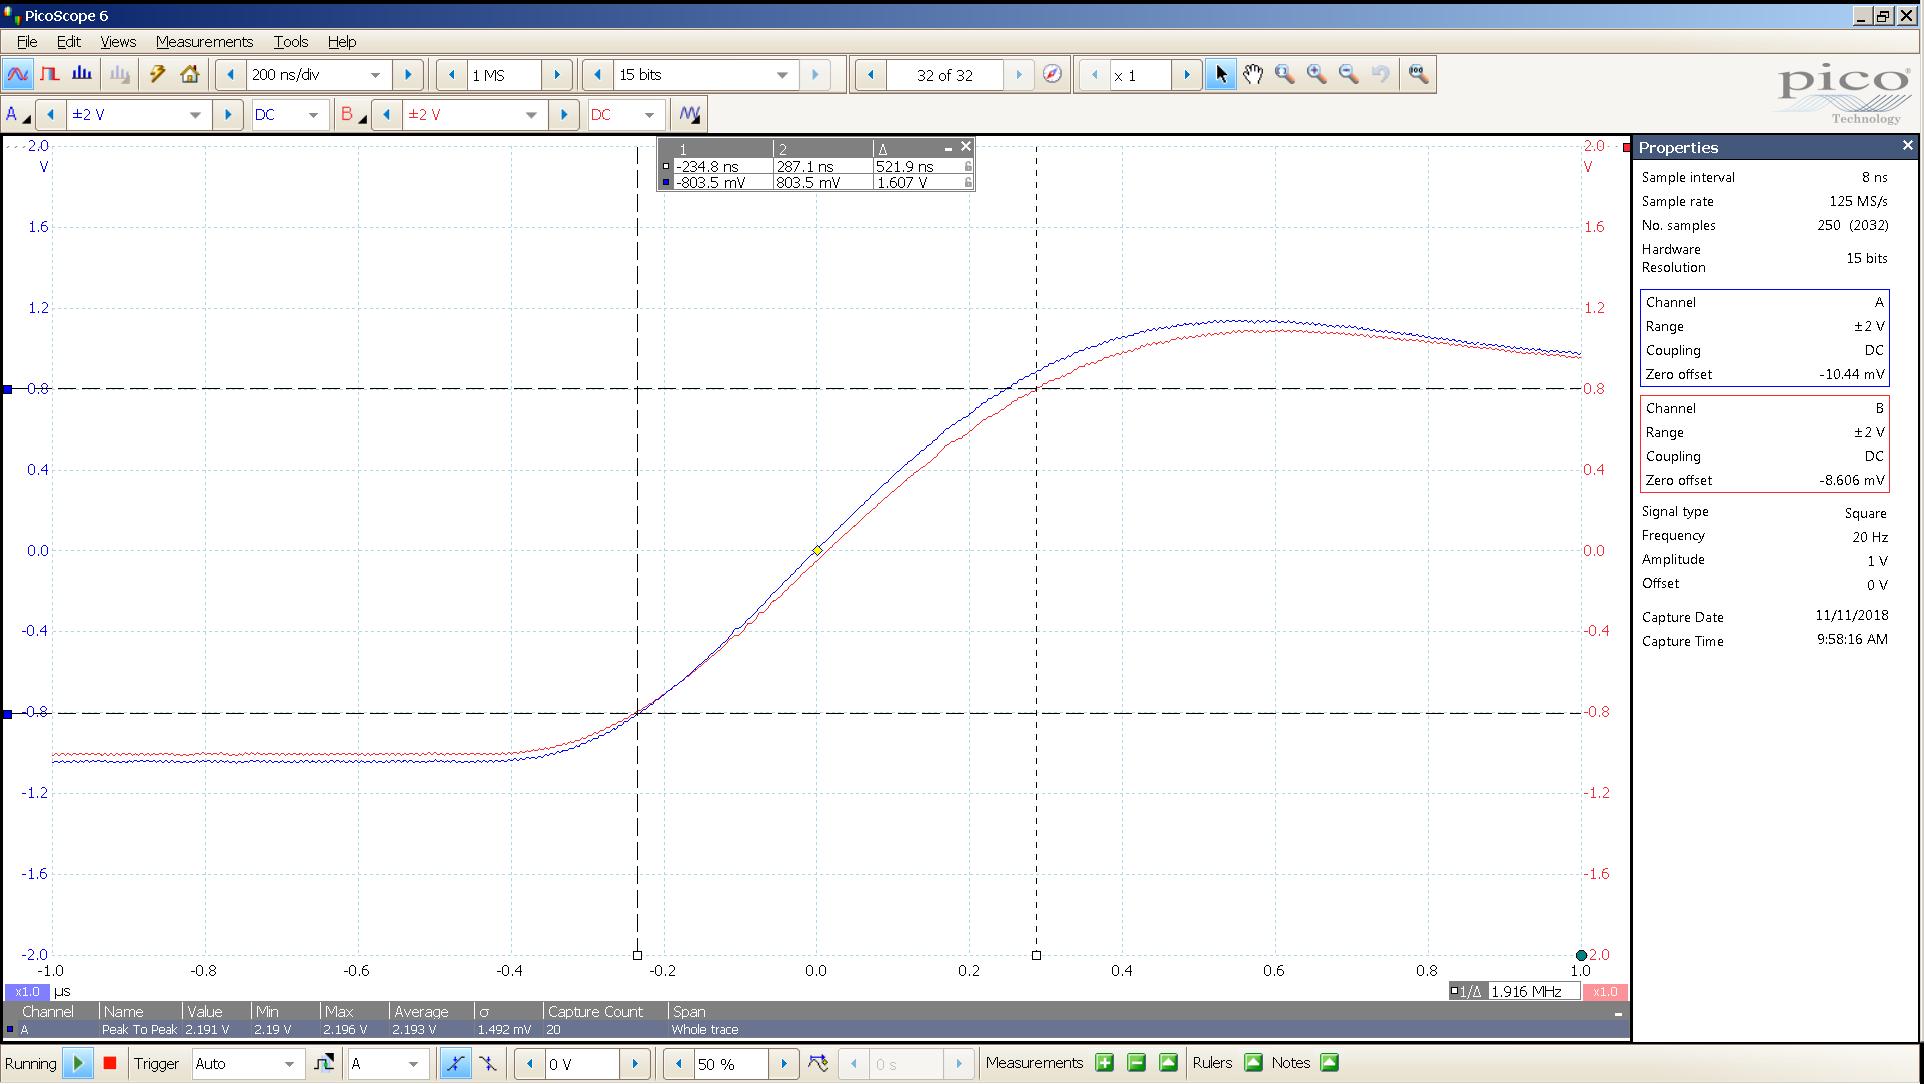 20181110 SigGen LiqPlat 20 Hz square 2000mVpp 200nS div 20MHz filter 30R - BW calc.png